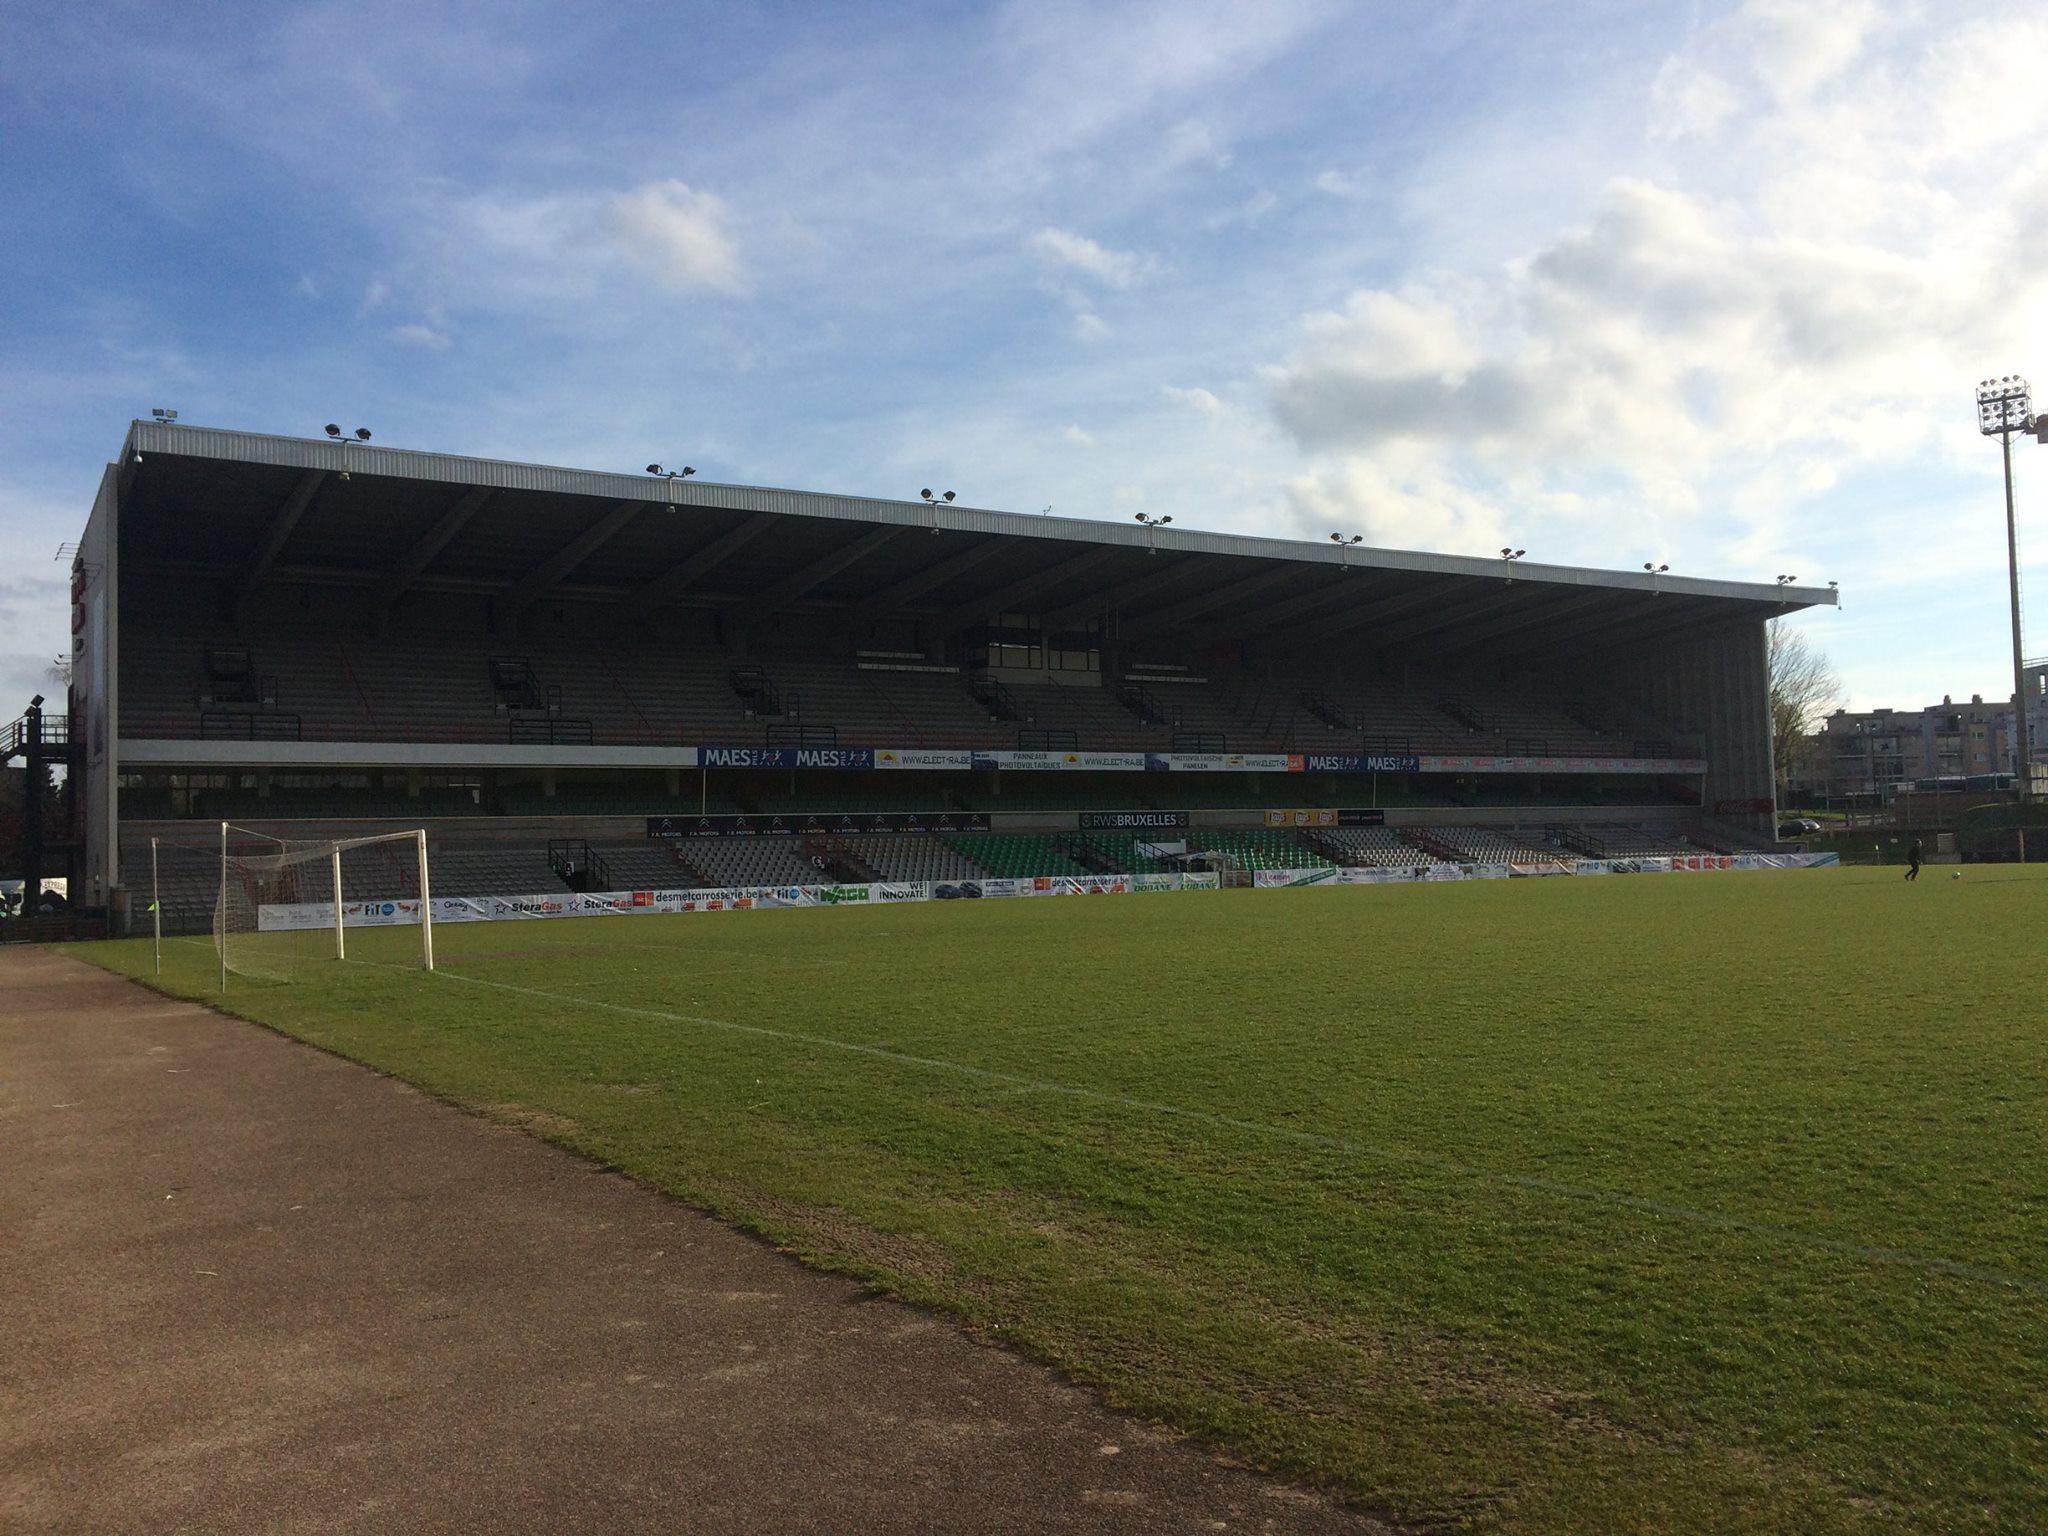 Stade Machtens ou évolue le RWDM - Wikipedia